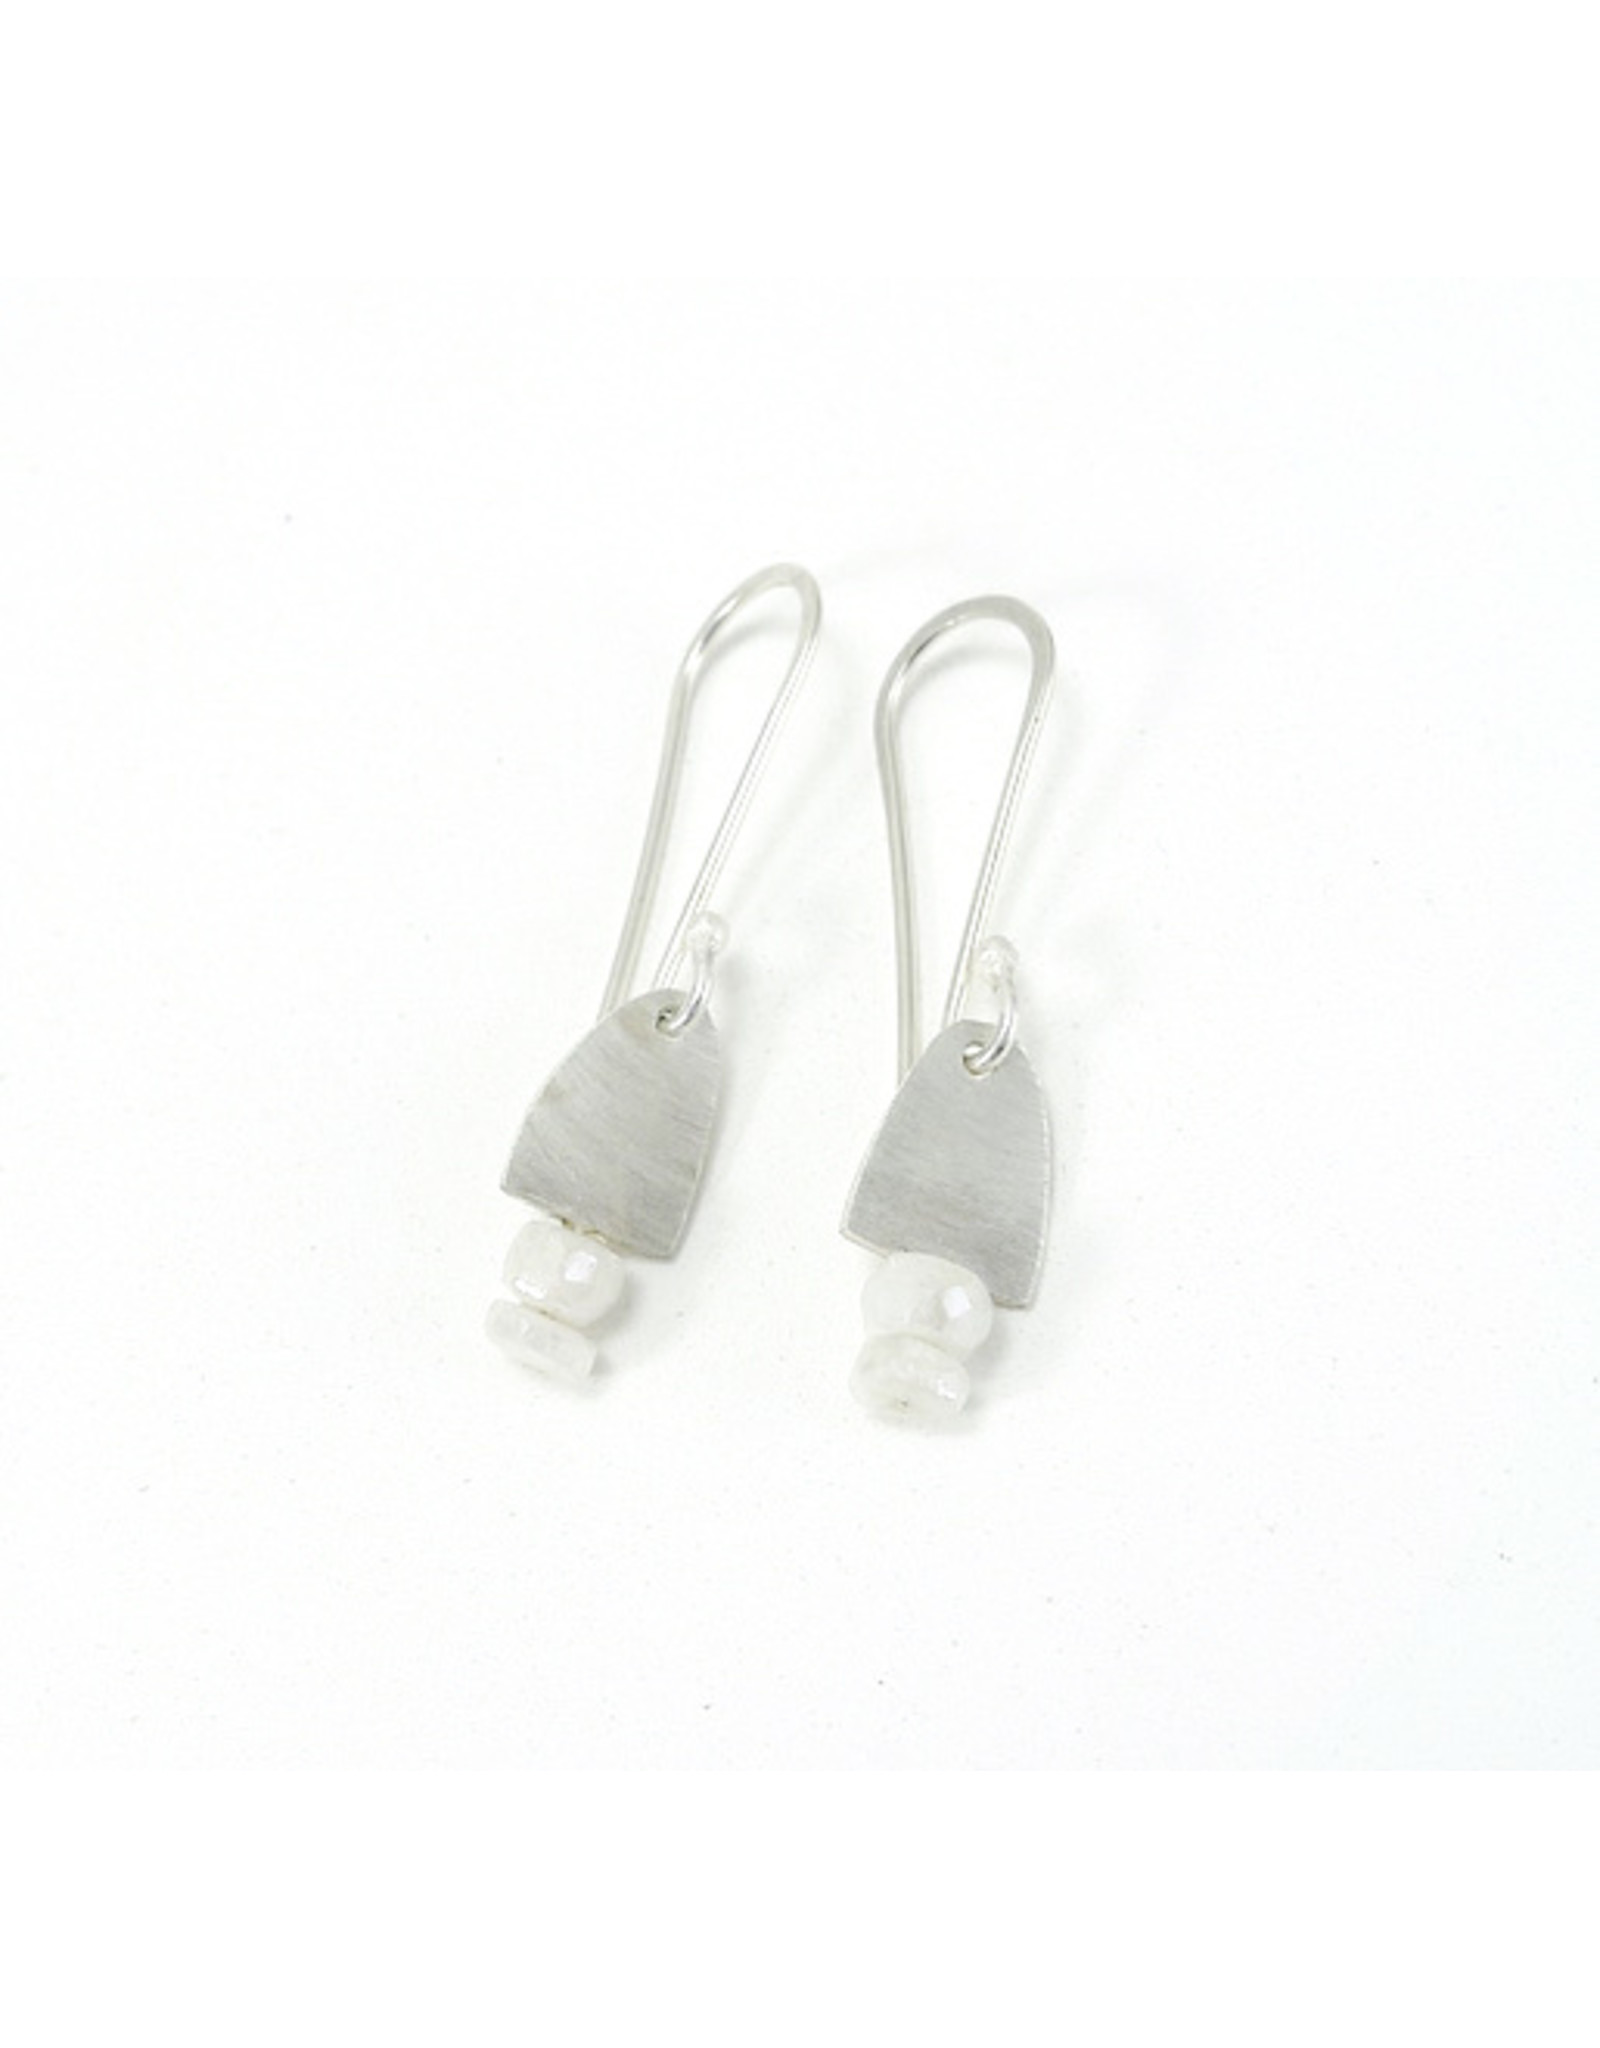 Bridget Clark - Consignment E2460 Tiny Silver Drops and Two Stone - White Sapphire